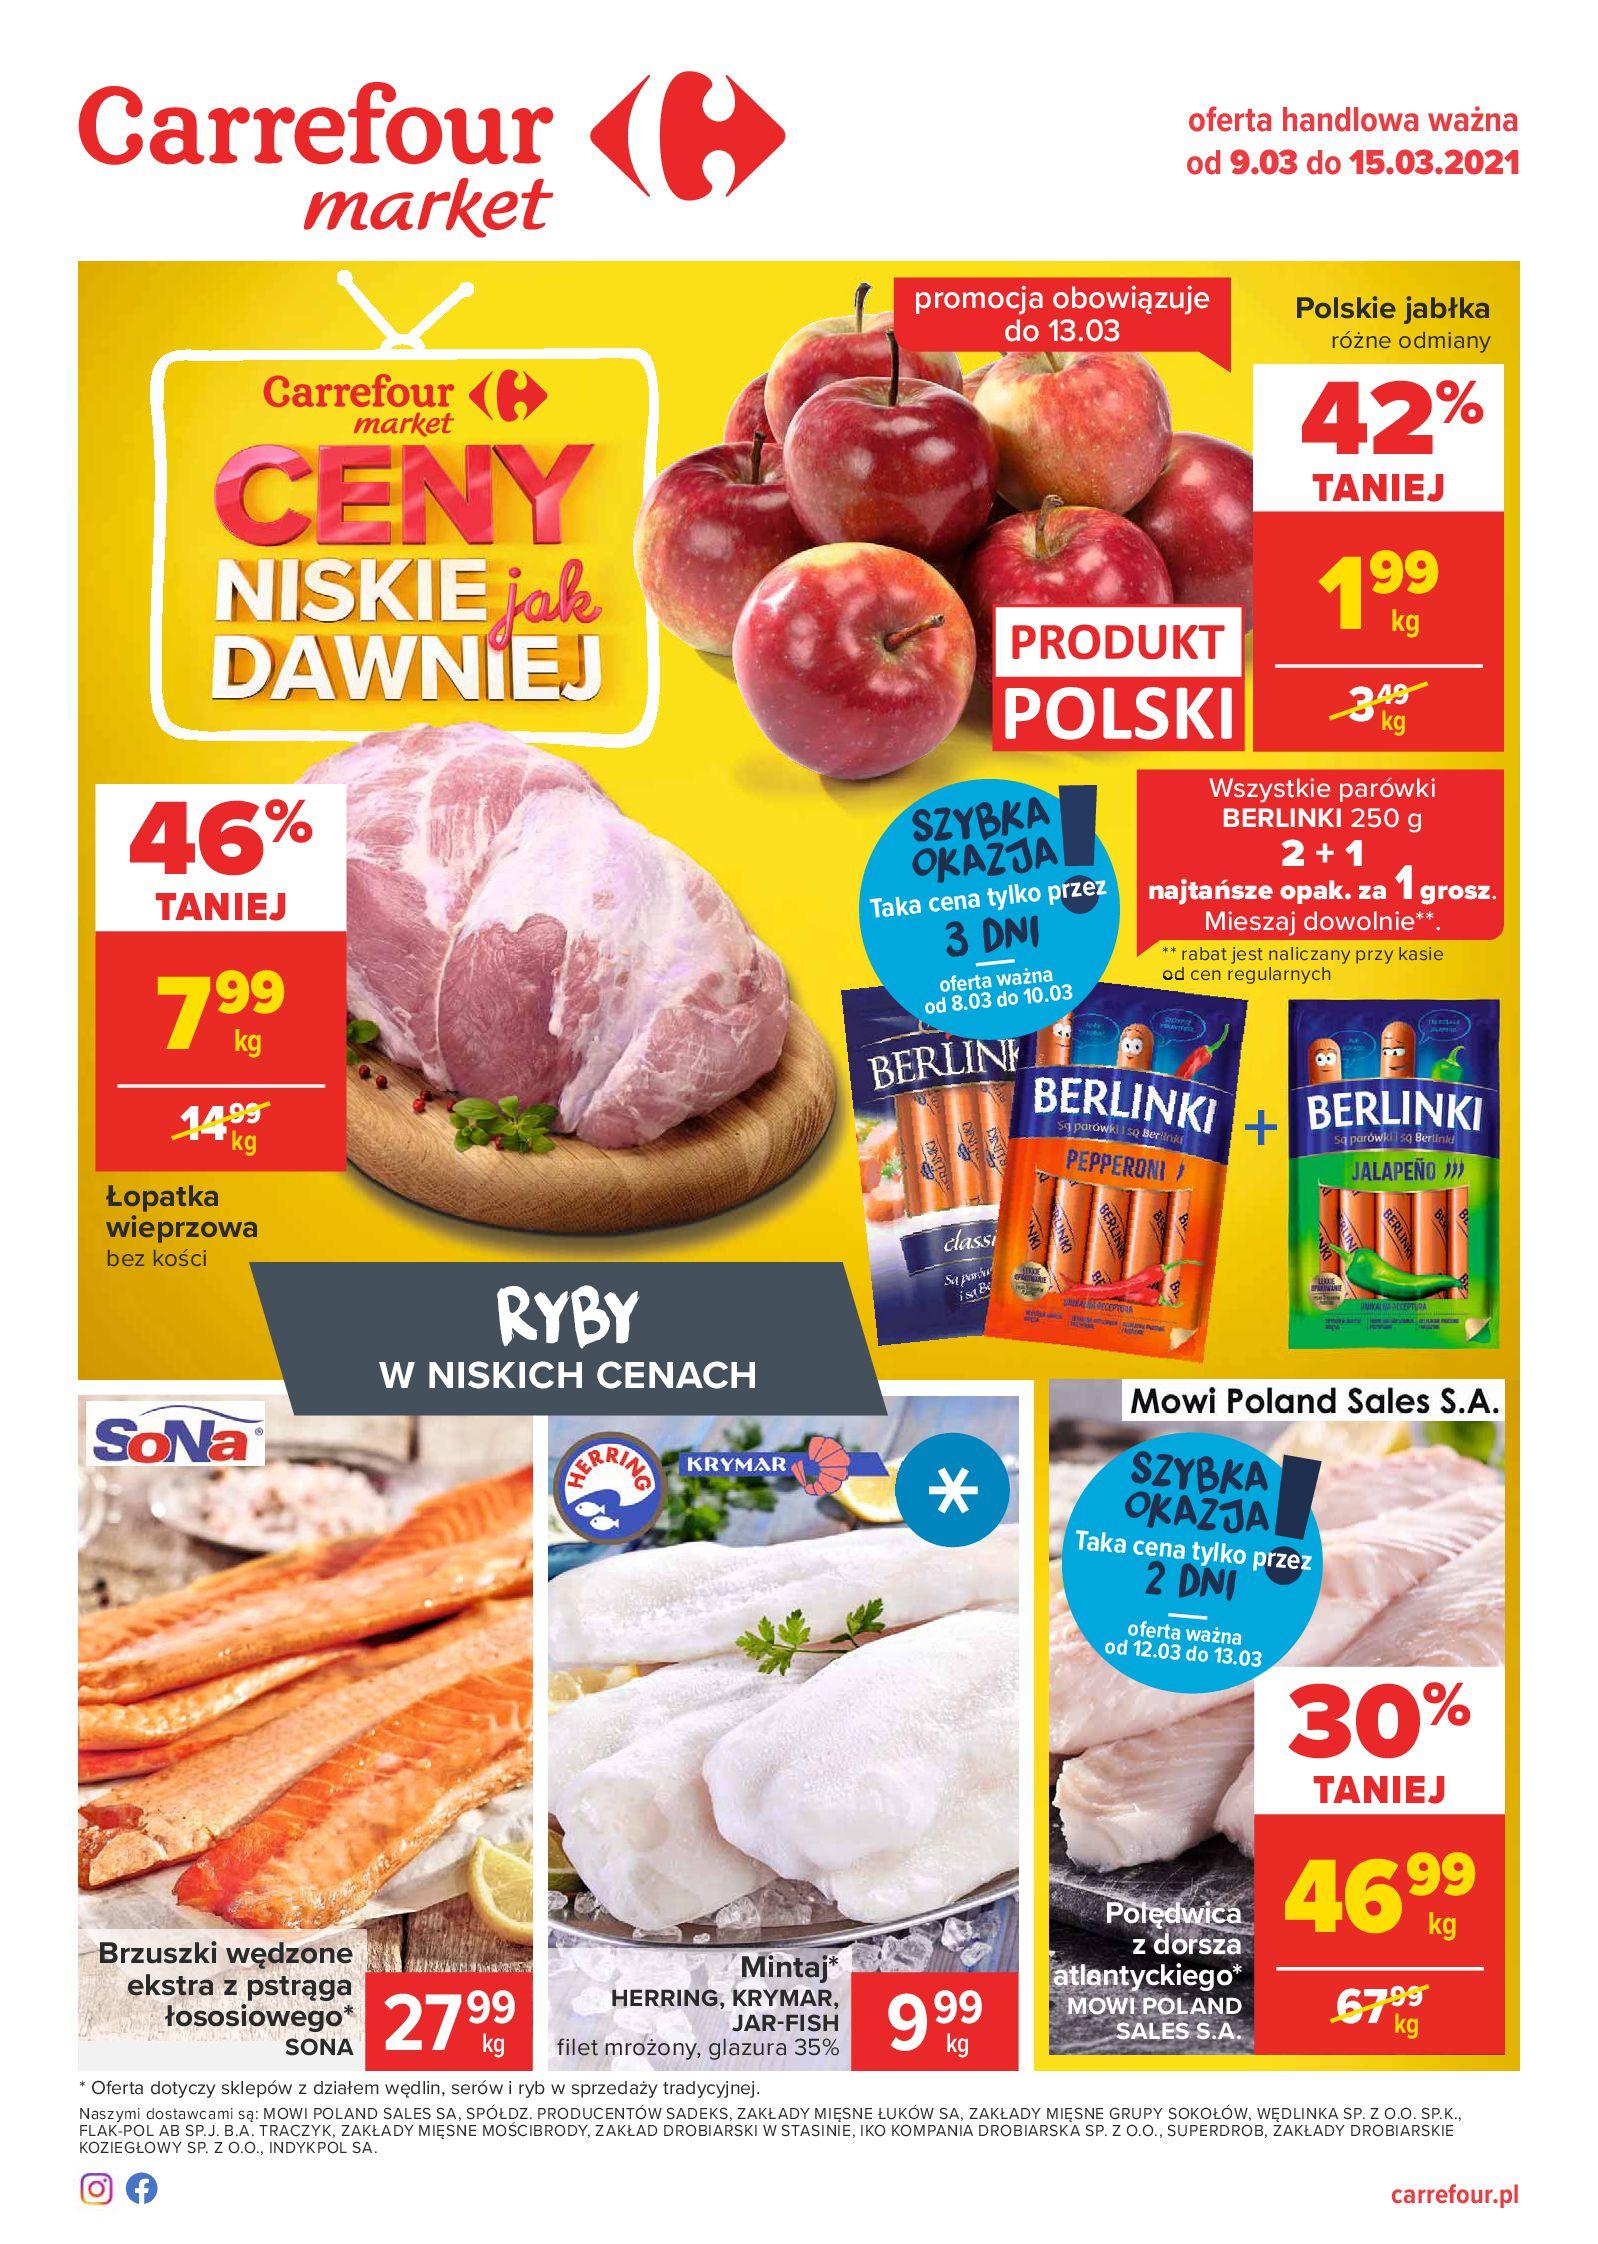 Carrefour Market:  Gazetka Market 08.03.2021